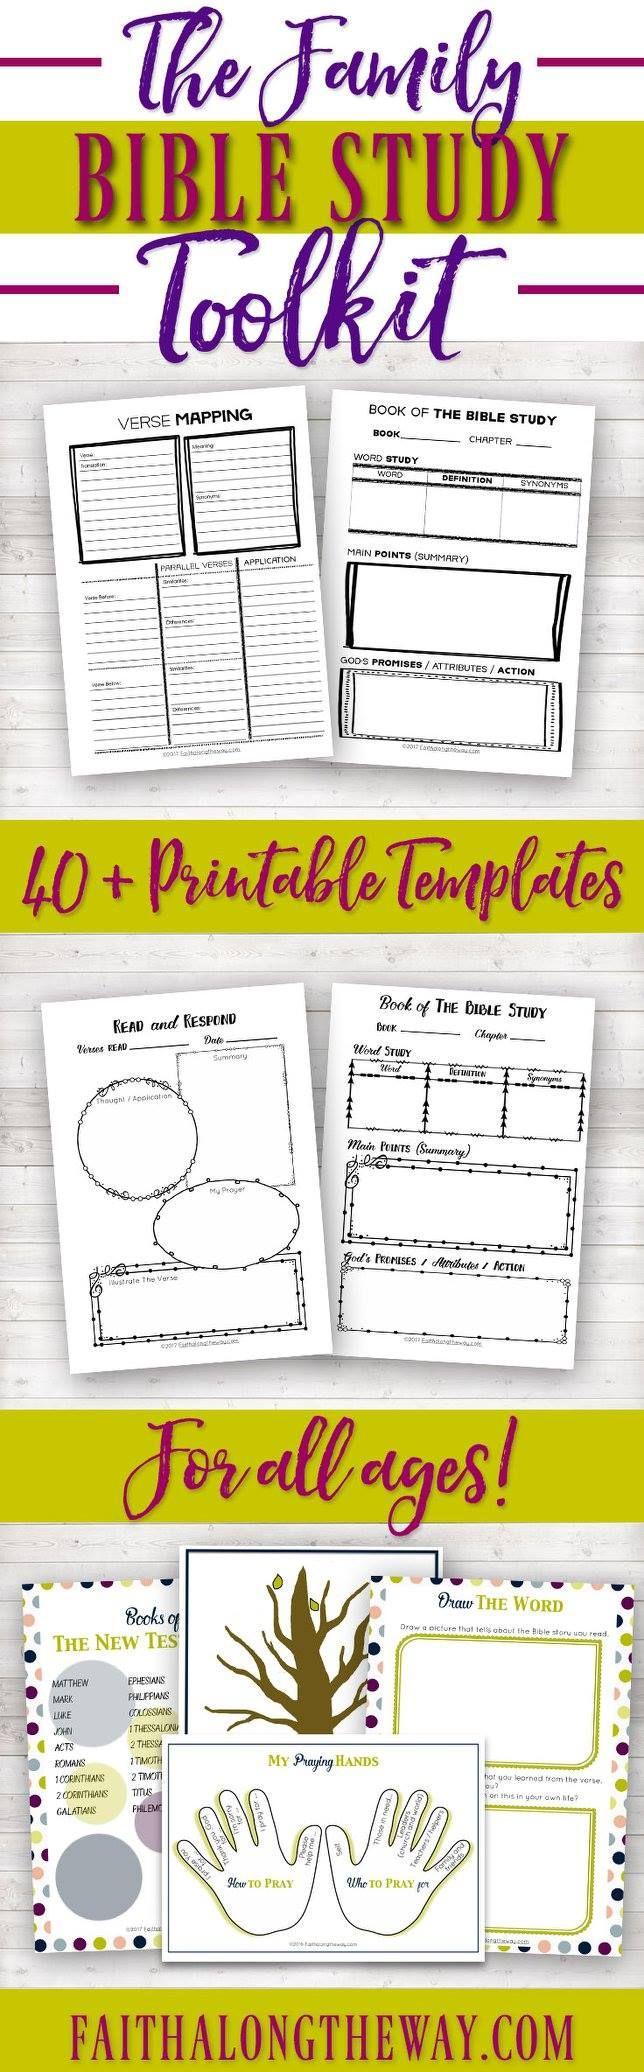 The Family Bible Study Toolkit|Bible Study|Printable|Women's|Kid's|Bible Journaling Templates|Men's|Guide